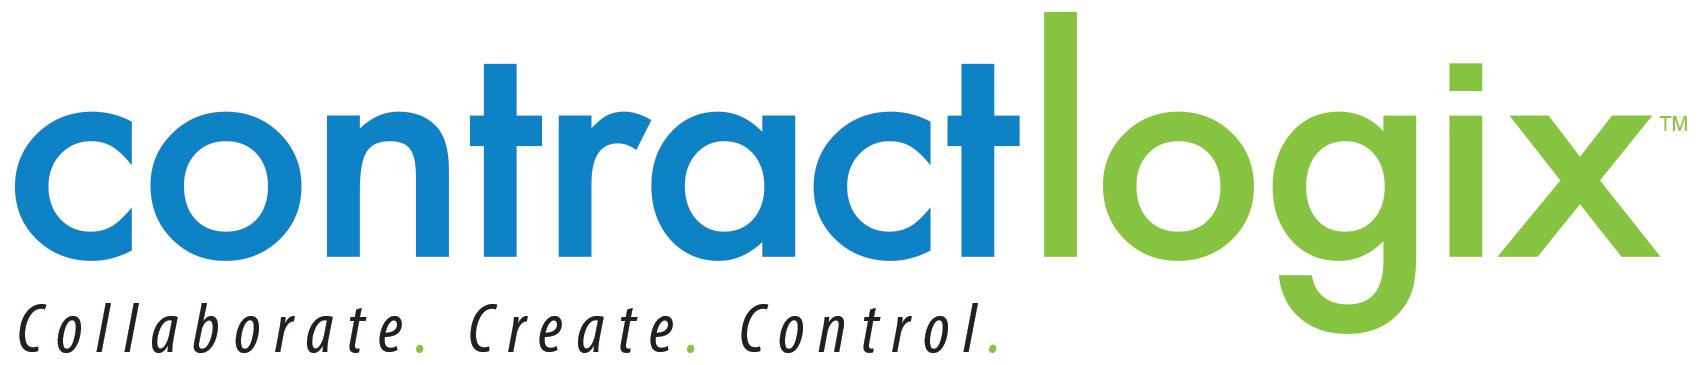 Contract Logix Enterprise Edition Technographics